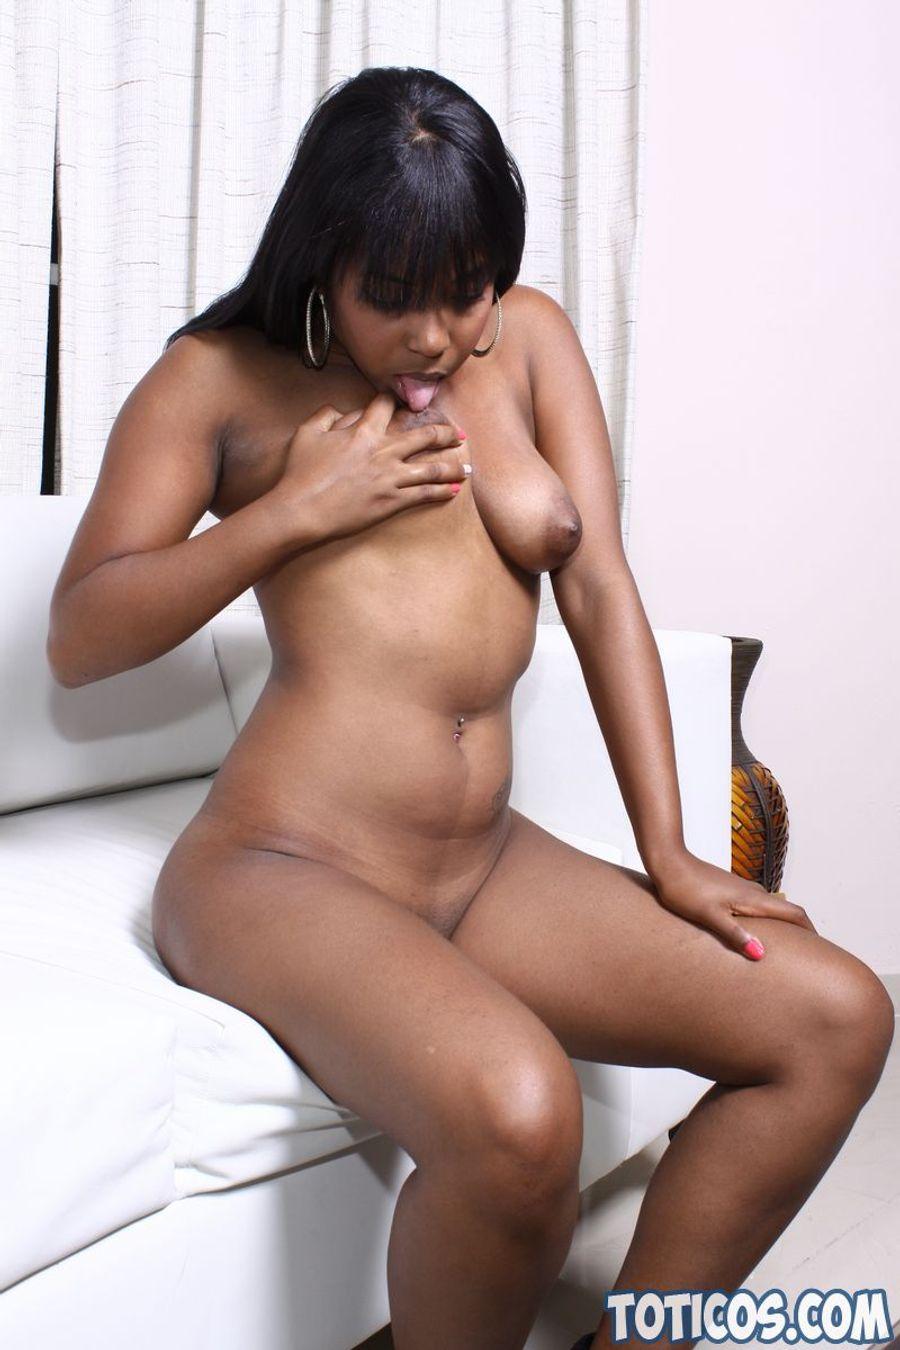 Bodacious Dominican Ebony Babe Photo Gallery Porn Pics -3575